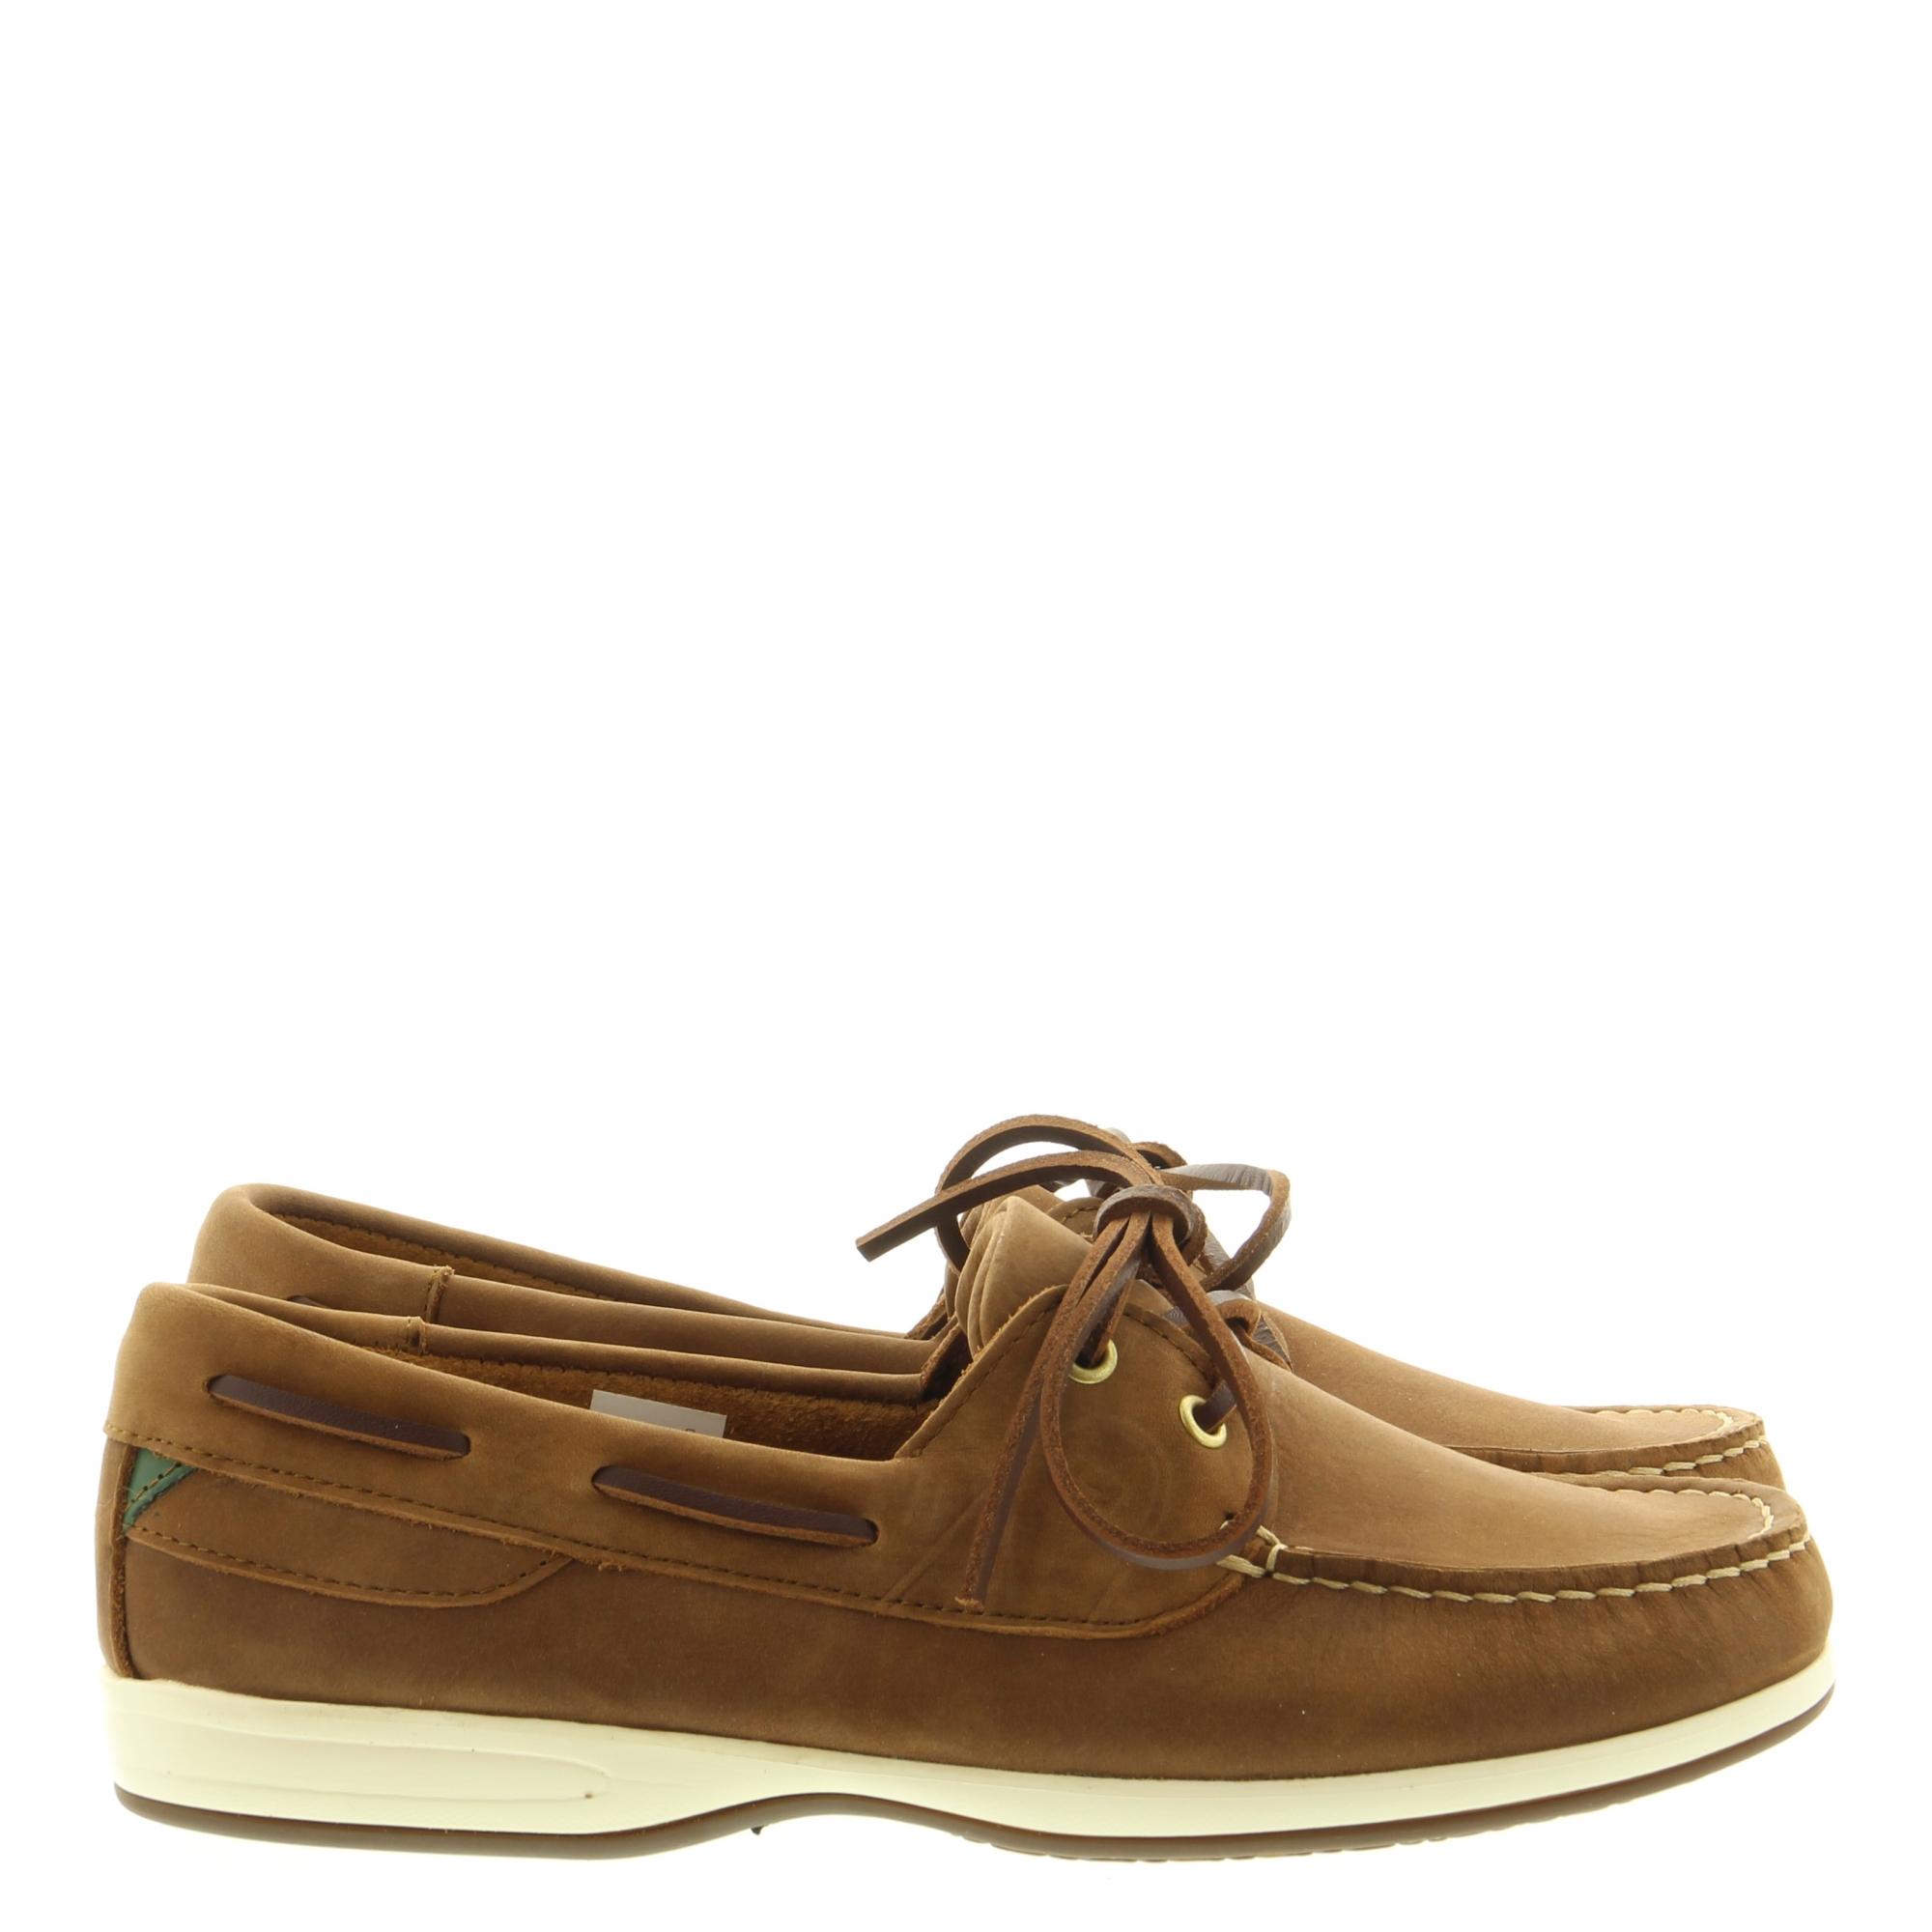 Dubarry 3737 Elba X LT 95 Brown